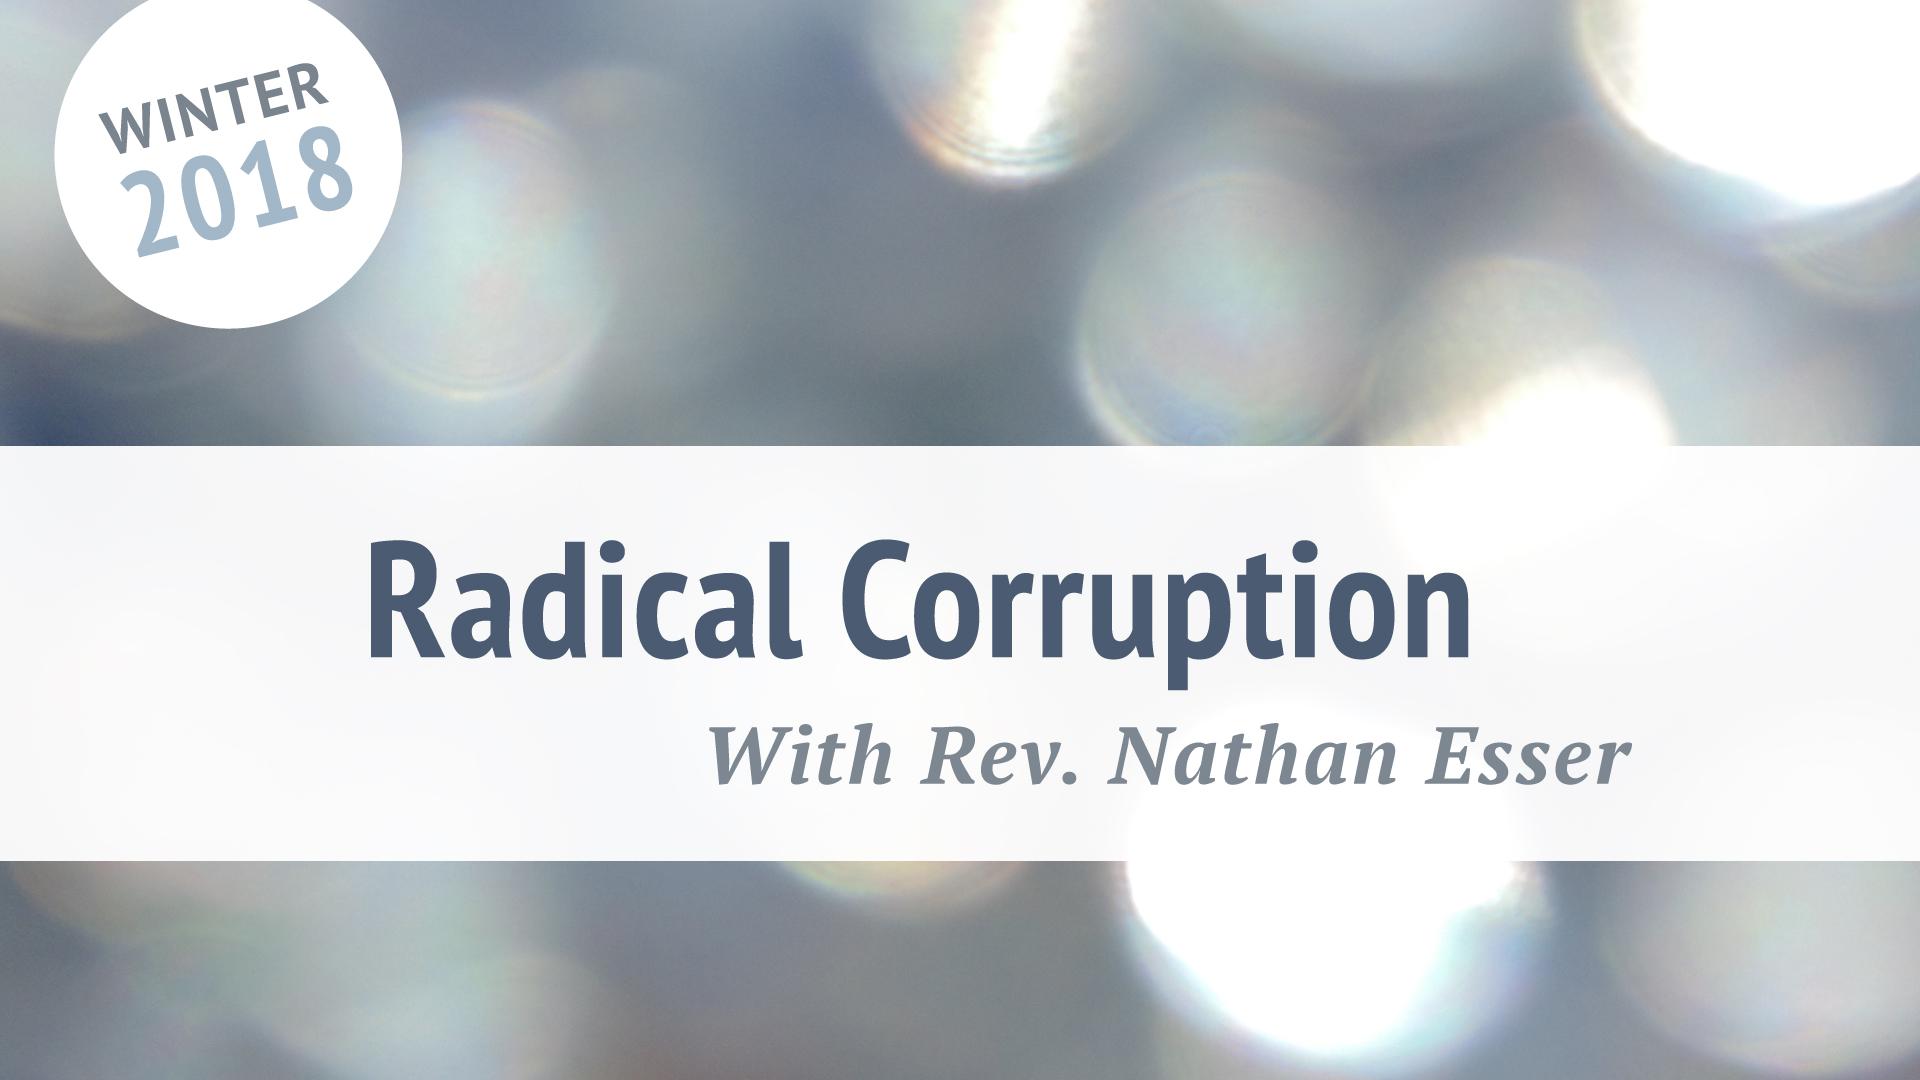 RadicalCorruption.jpg